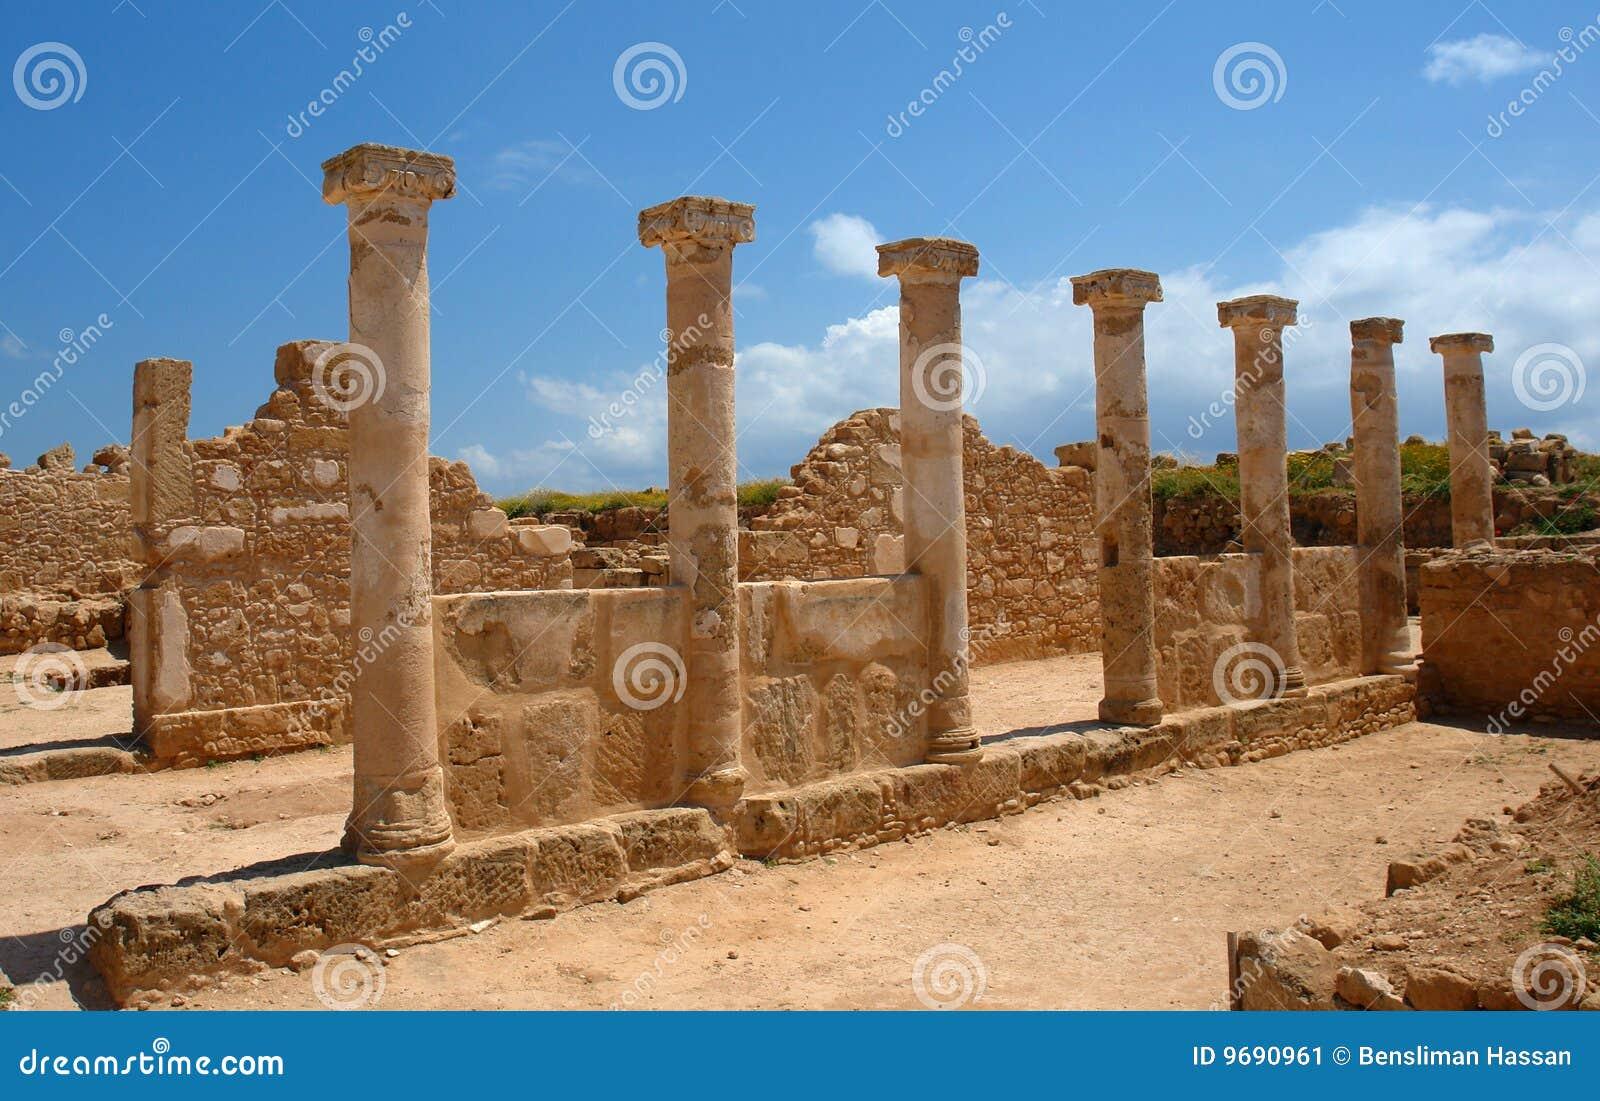 Pillar in Paphos, cyprus island